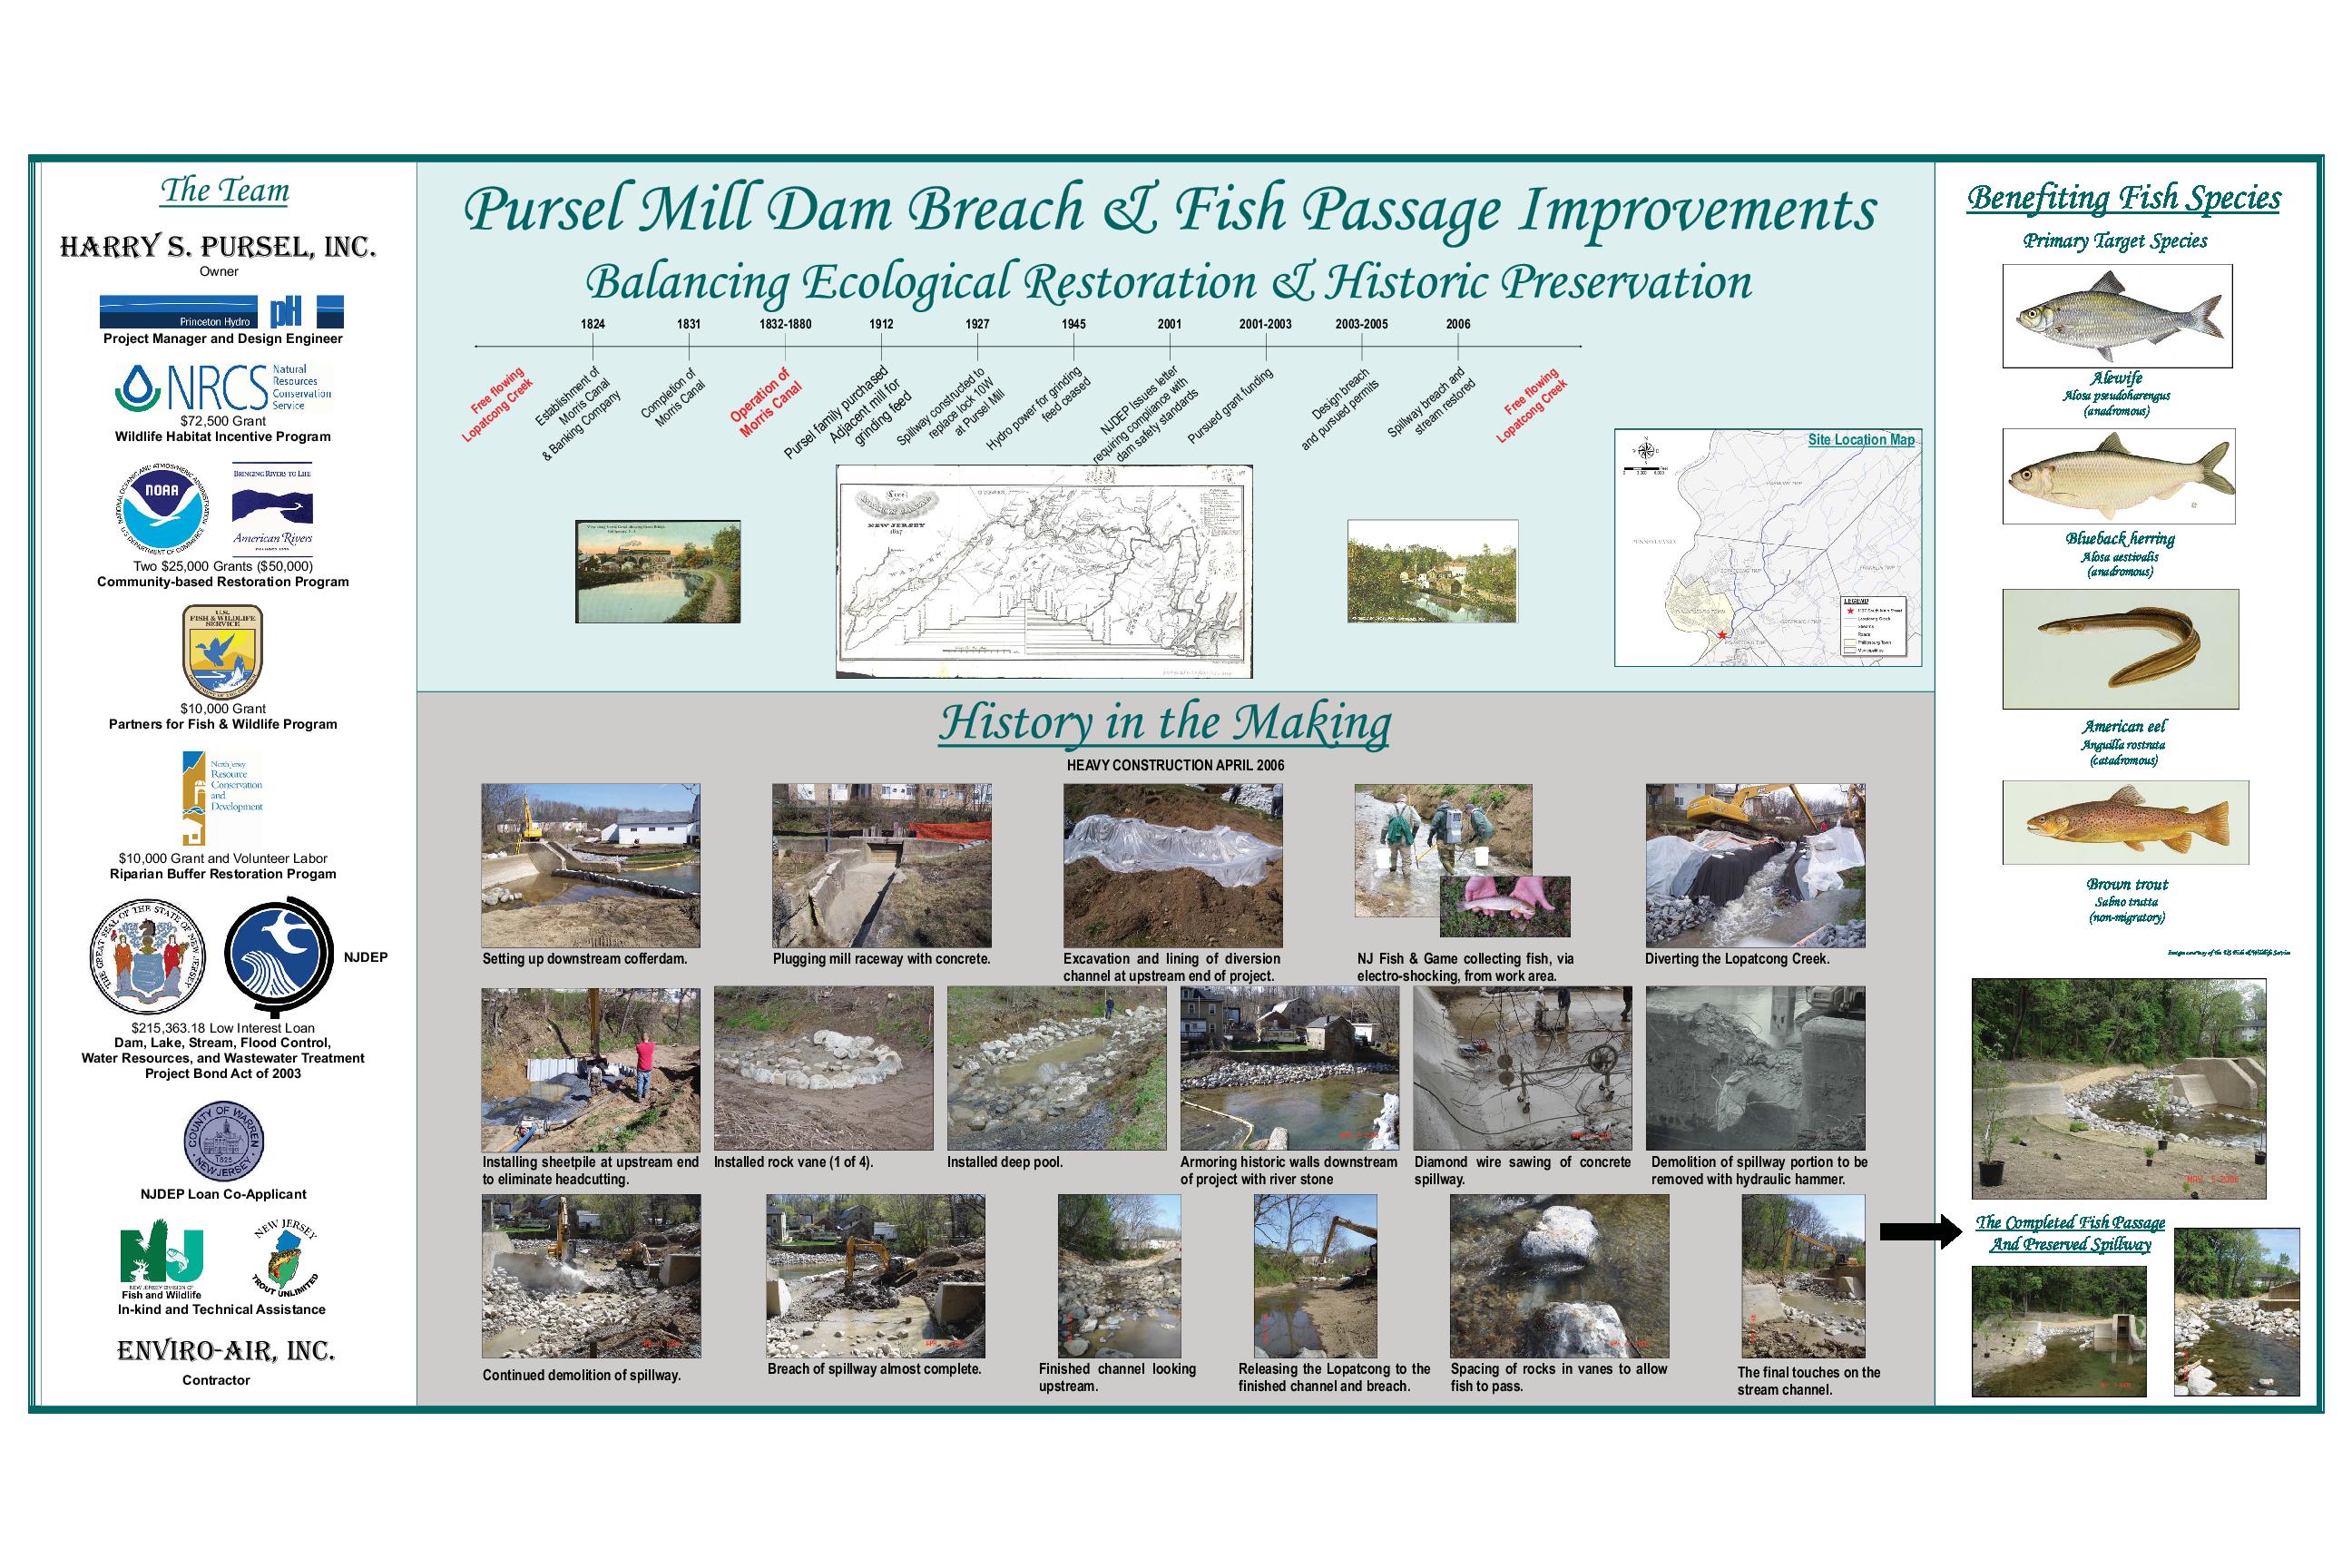 Pursel Mill Dam Breach & Fish Passage Improvements: Balancing Ecological Restoration & Historical Preservation